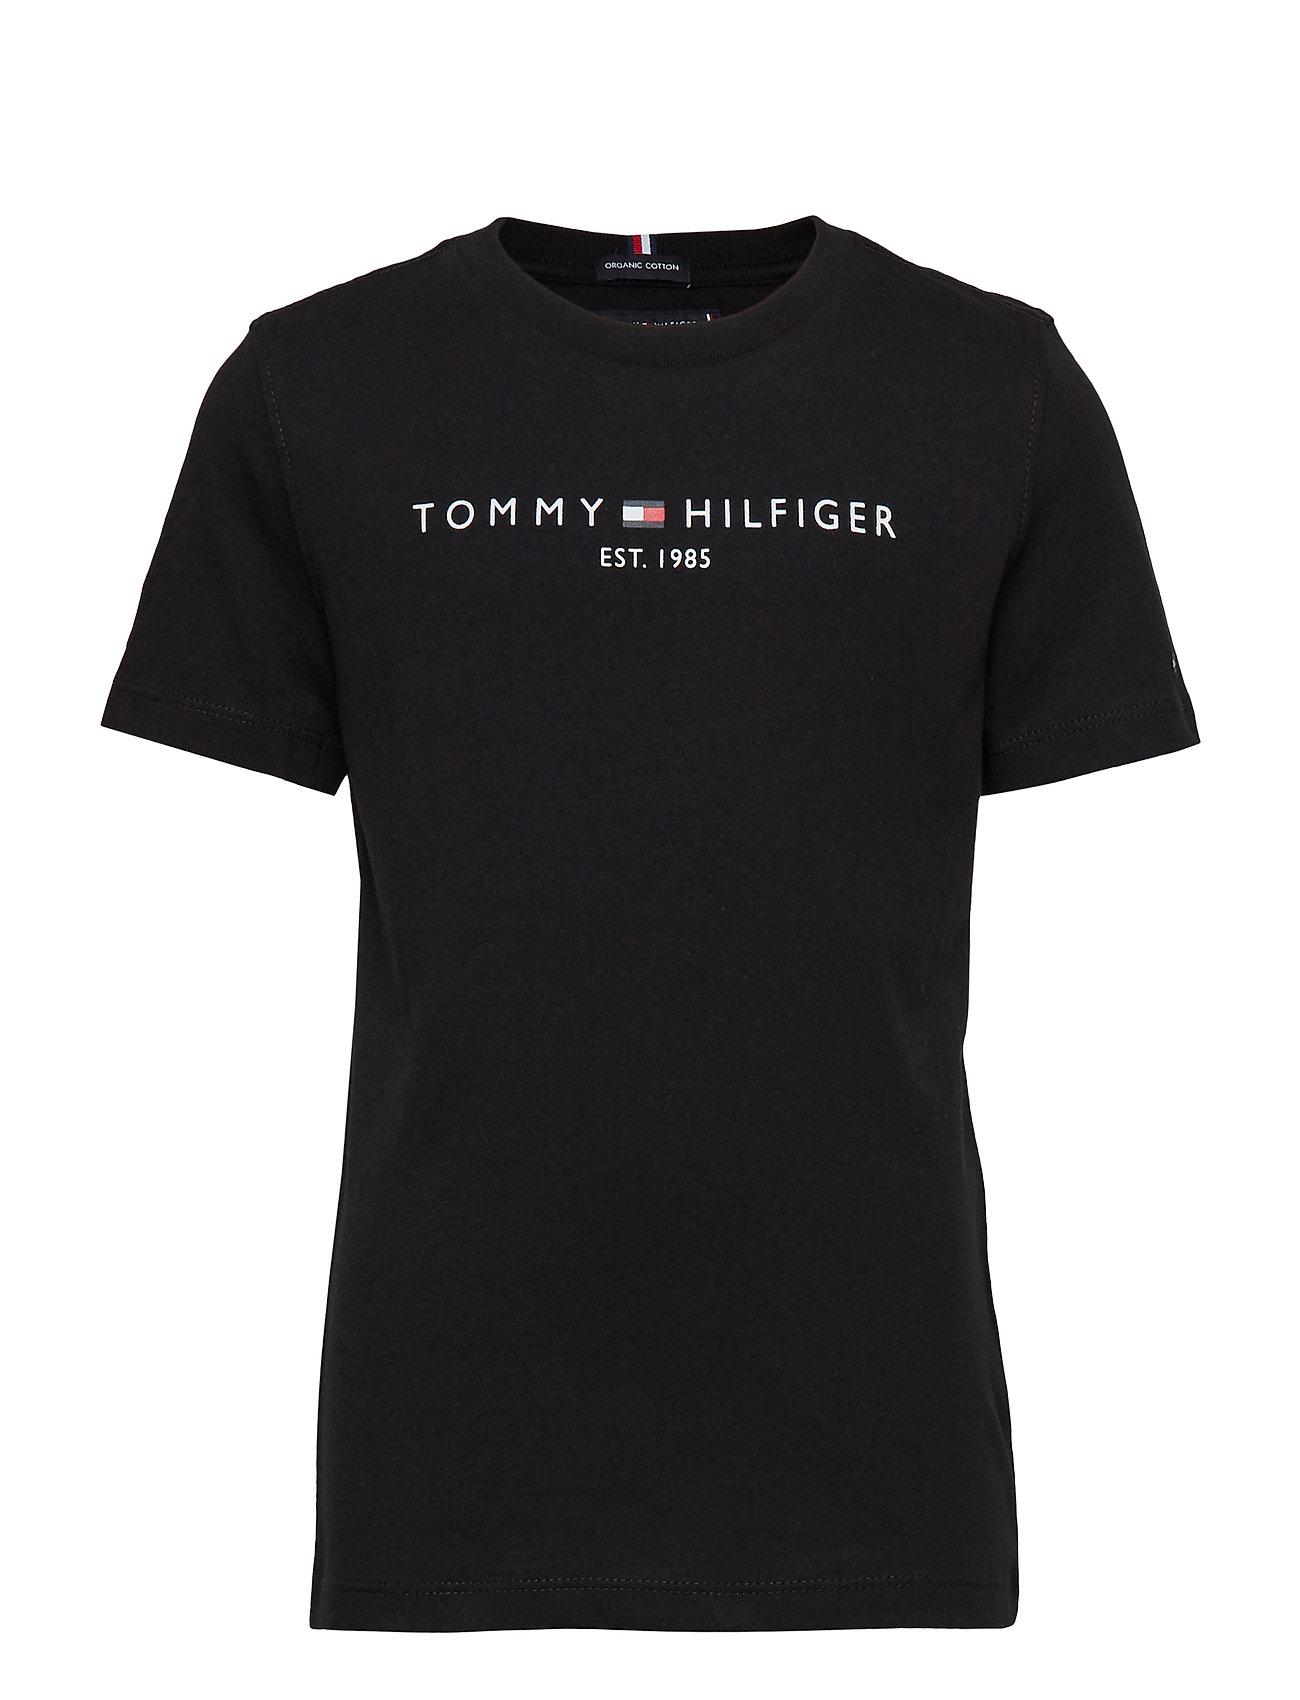 Tommy Hilfiger ESSENTIAL HILFIGER T - TOMMY BLACK